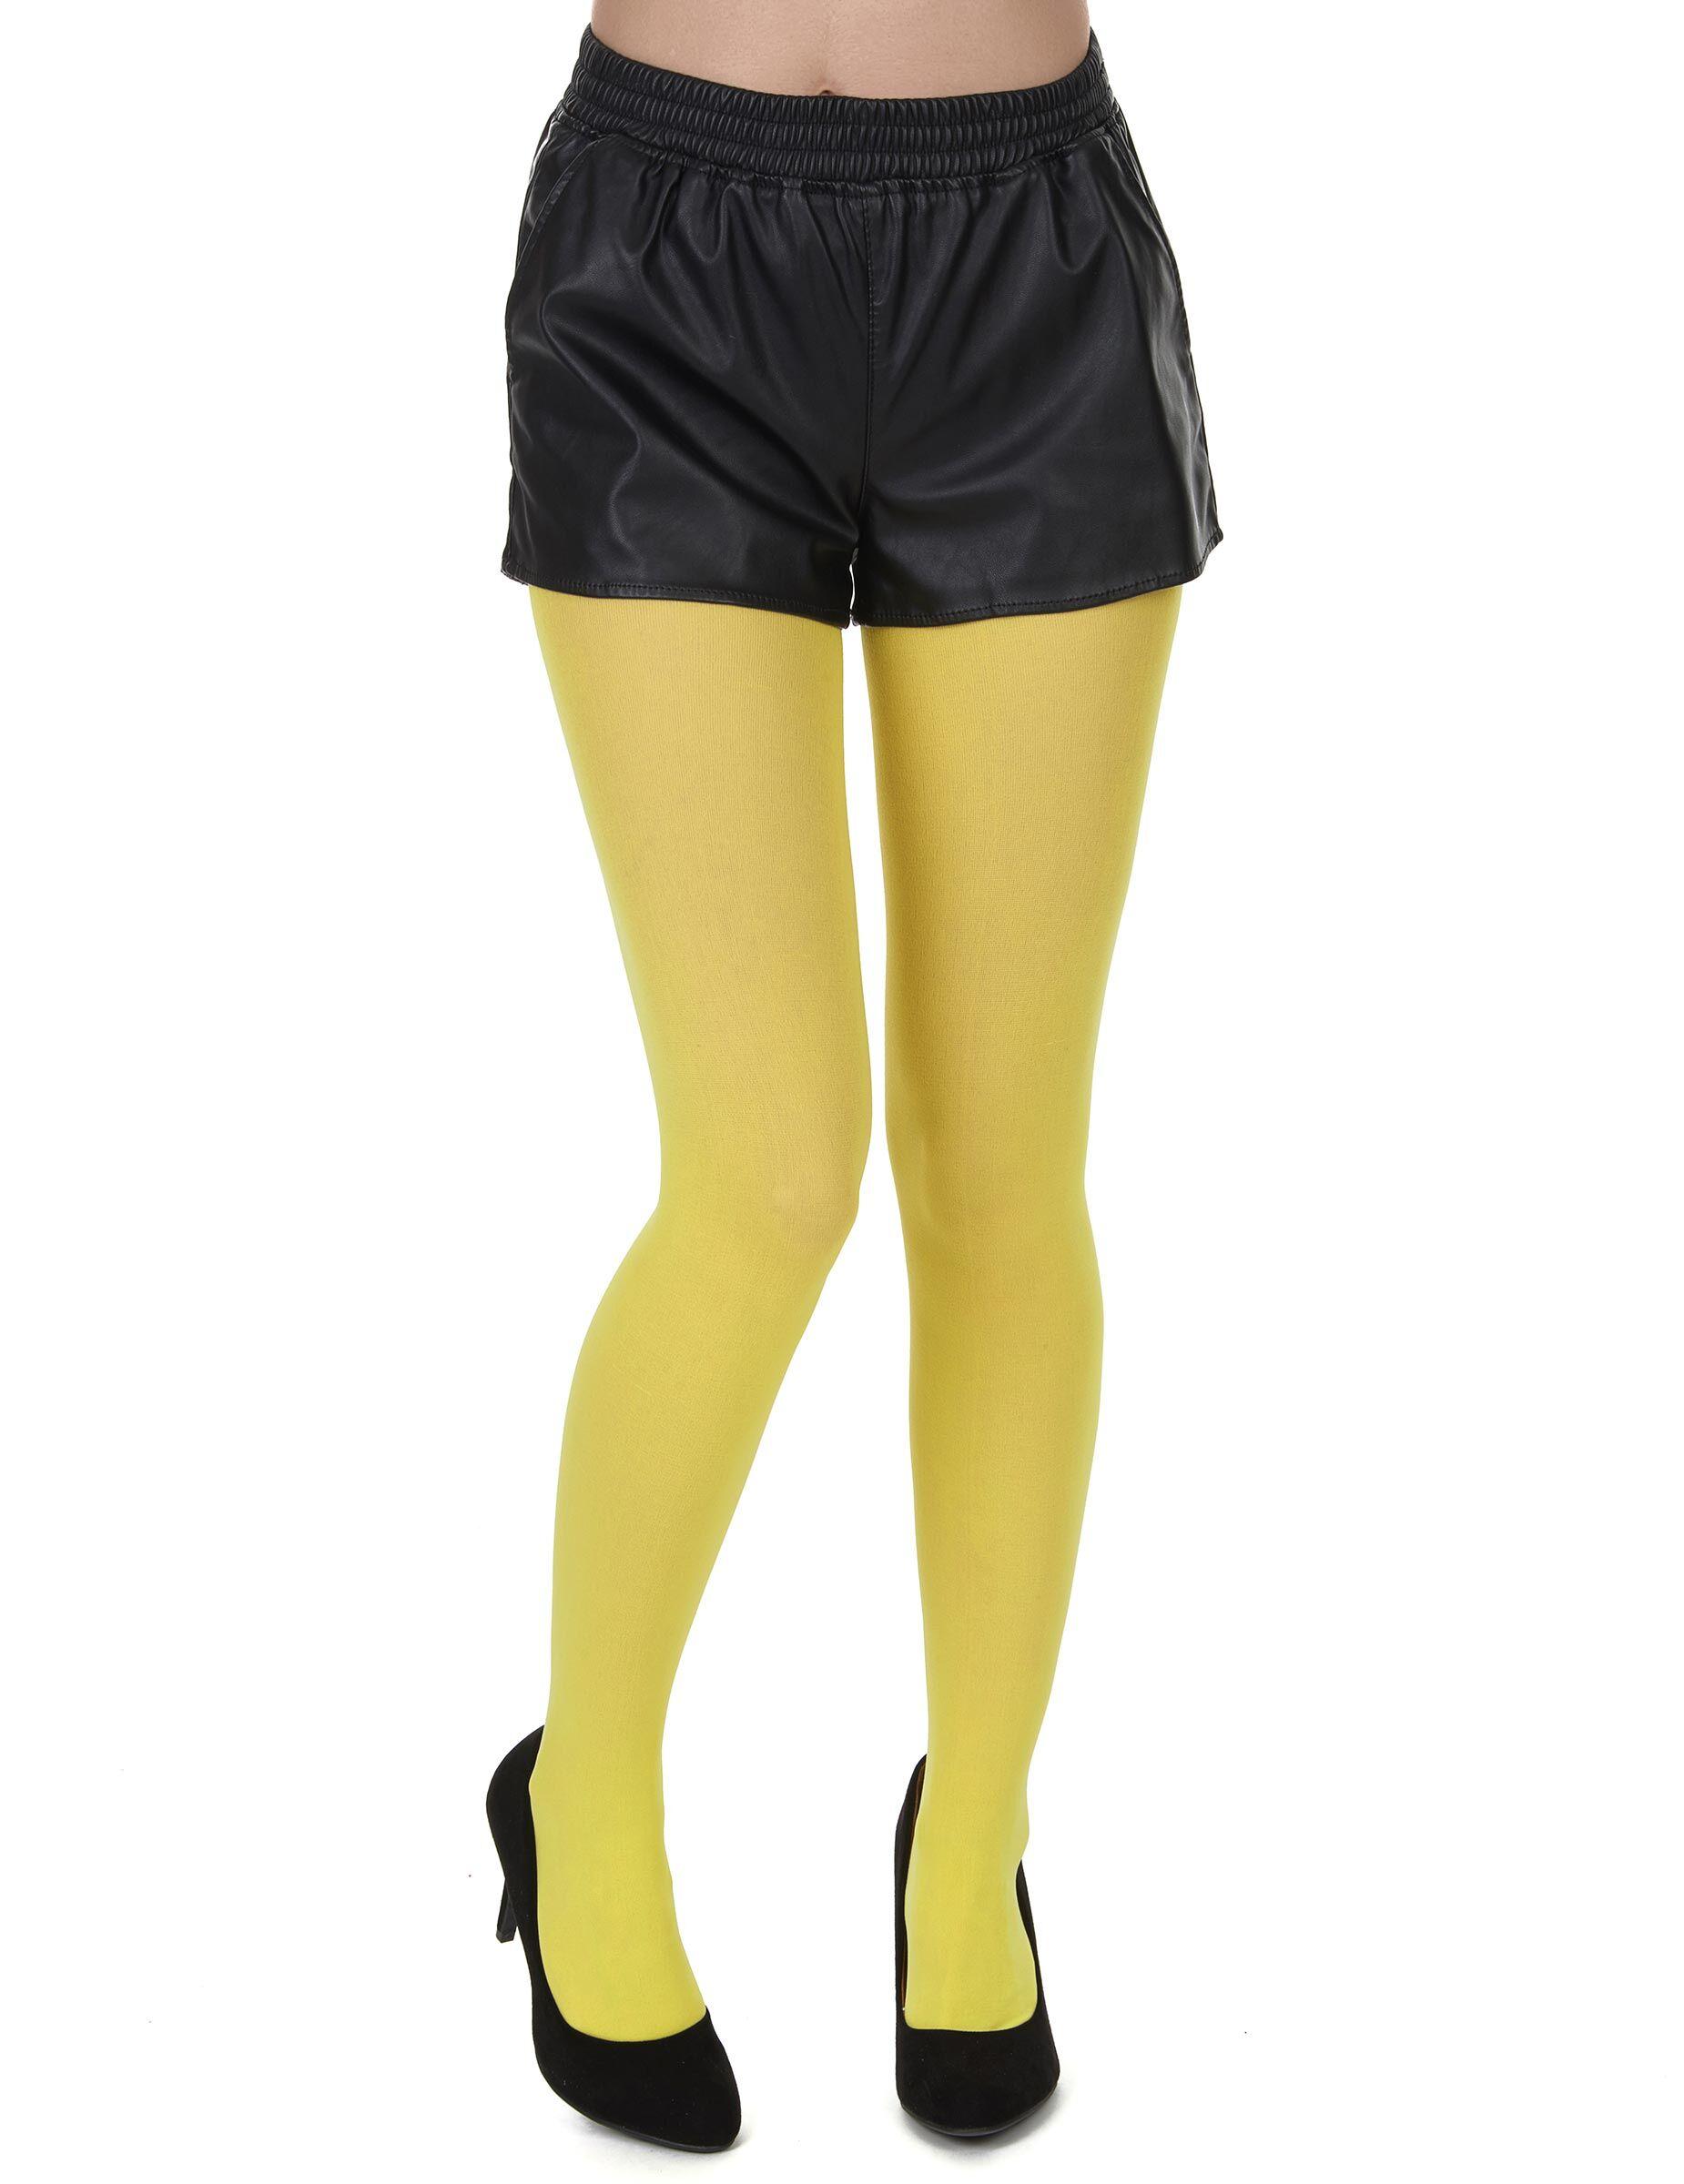 Deguisetoi Collants opaques jaunes adulte - Taille: XL